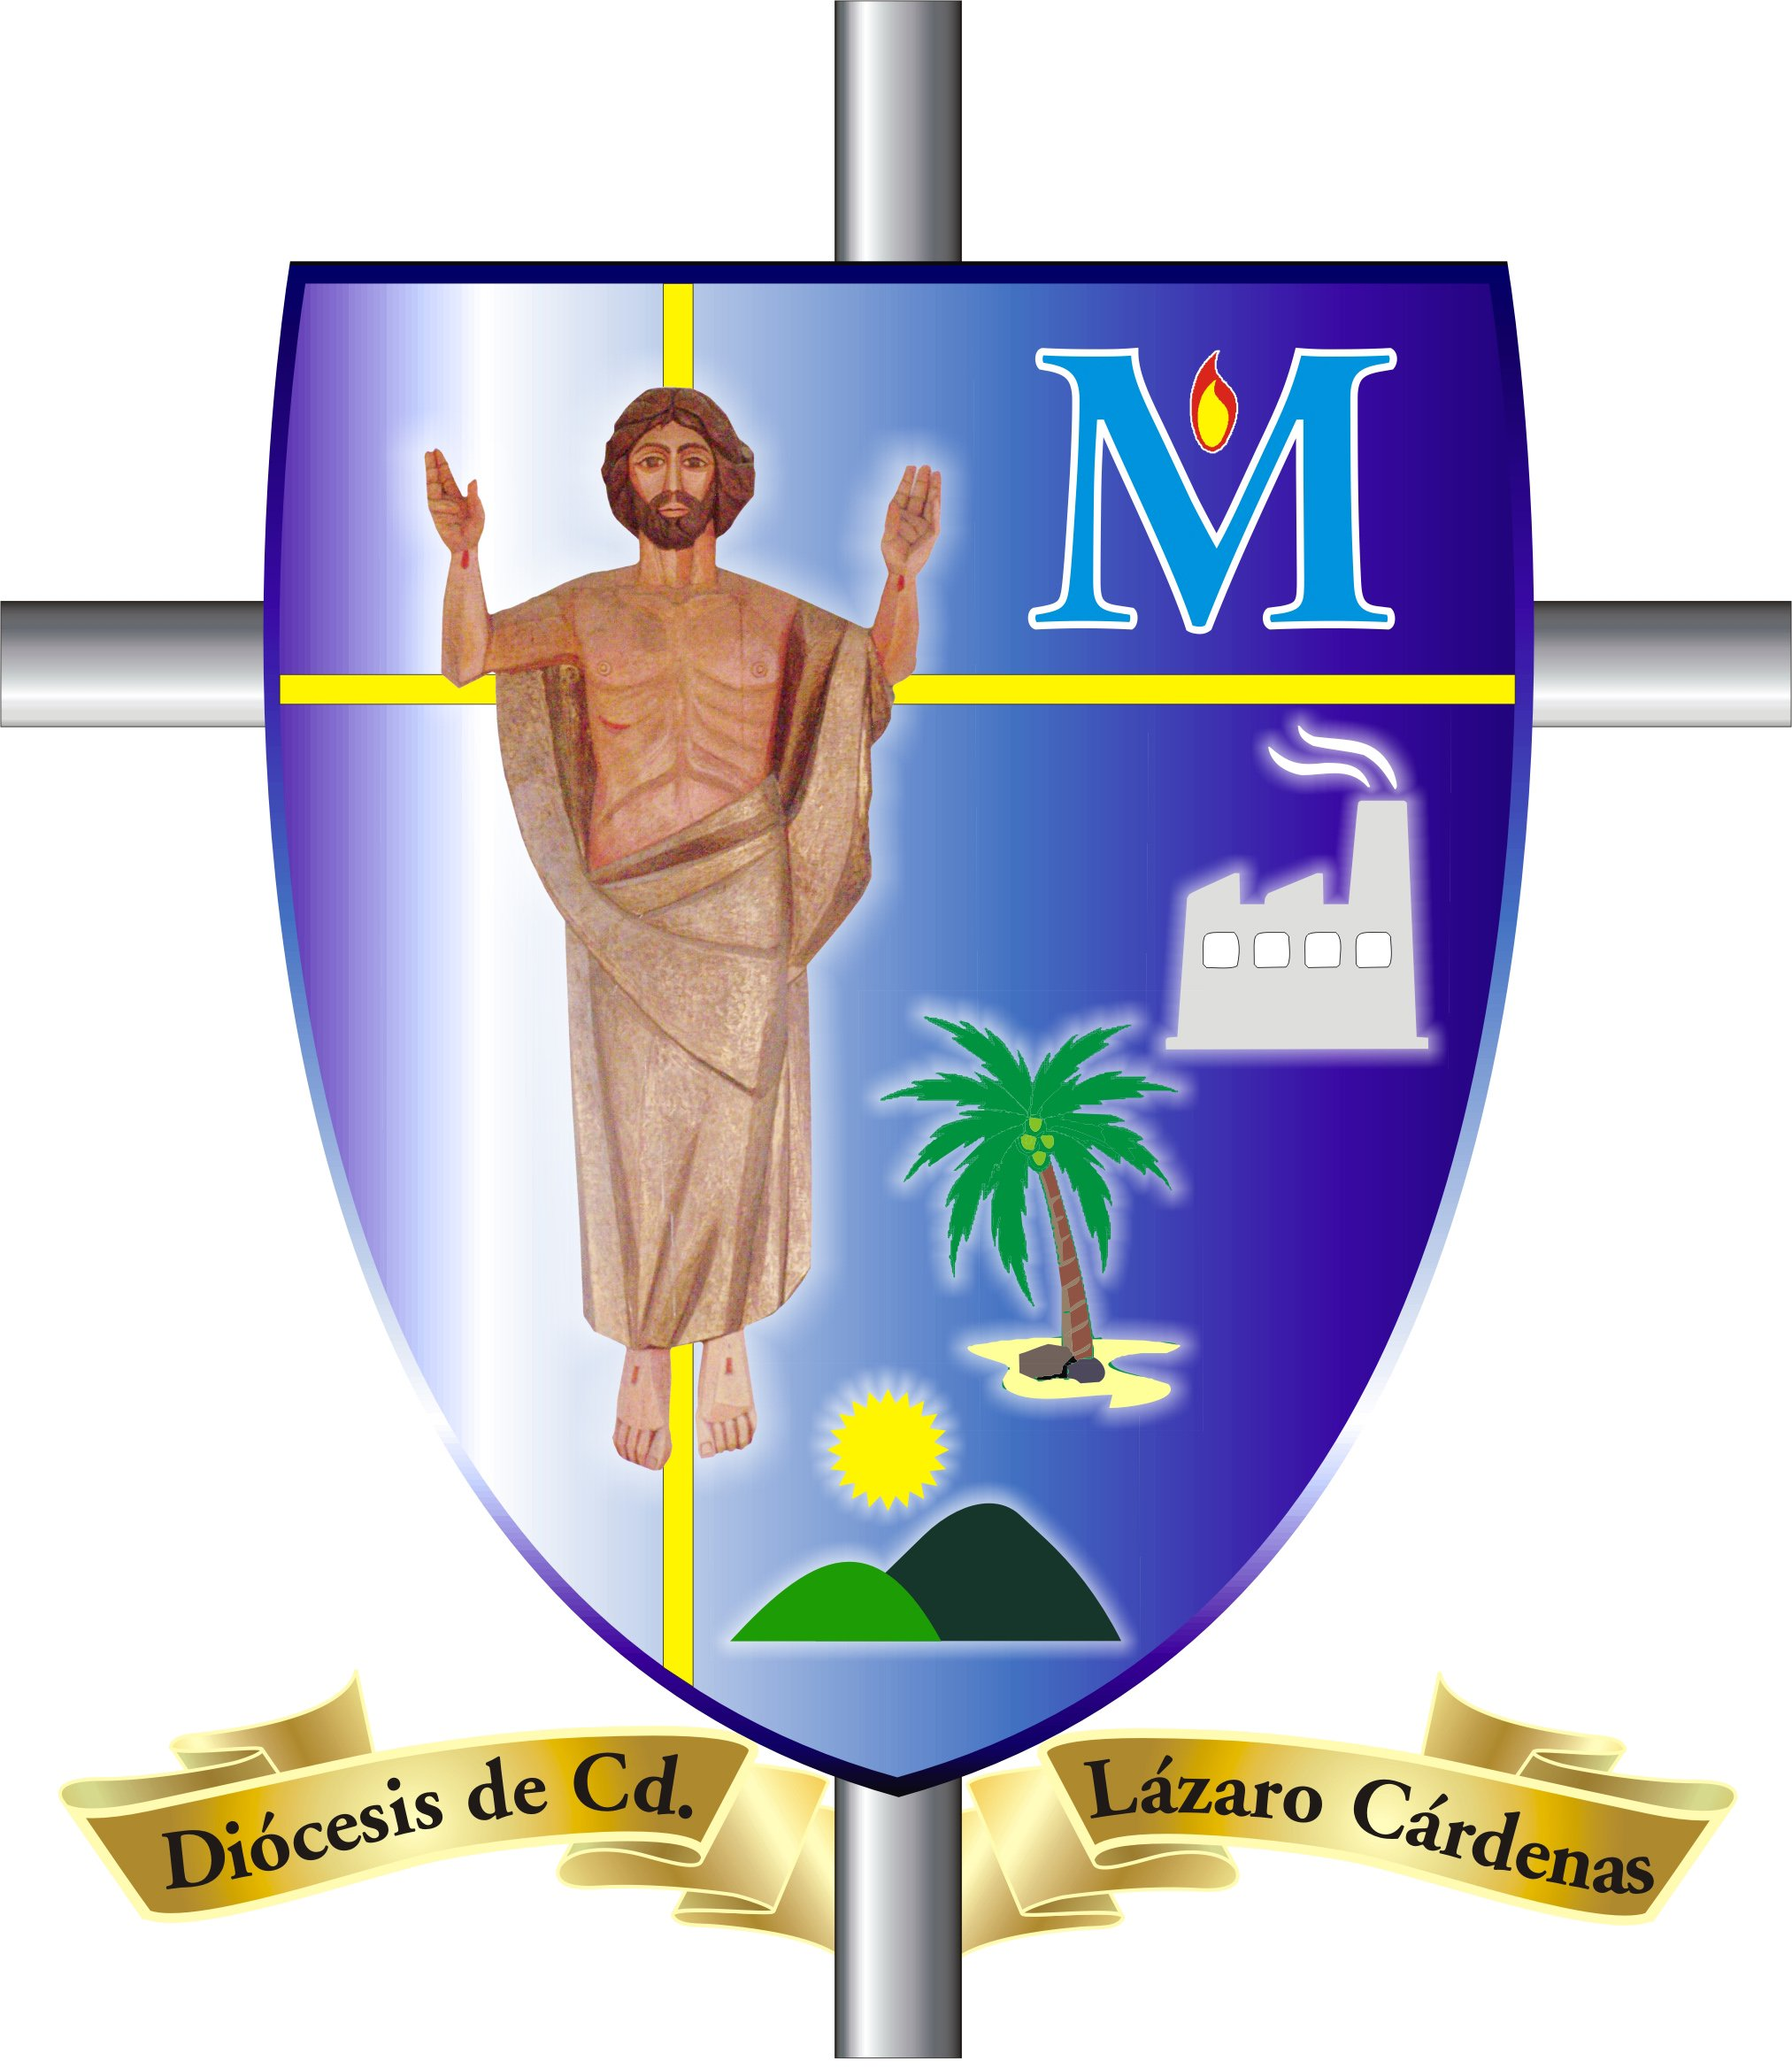 Diócesis de Cd. Lázaro Cárdenas